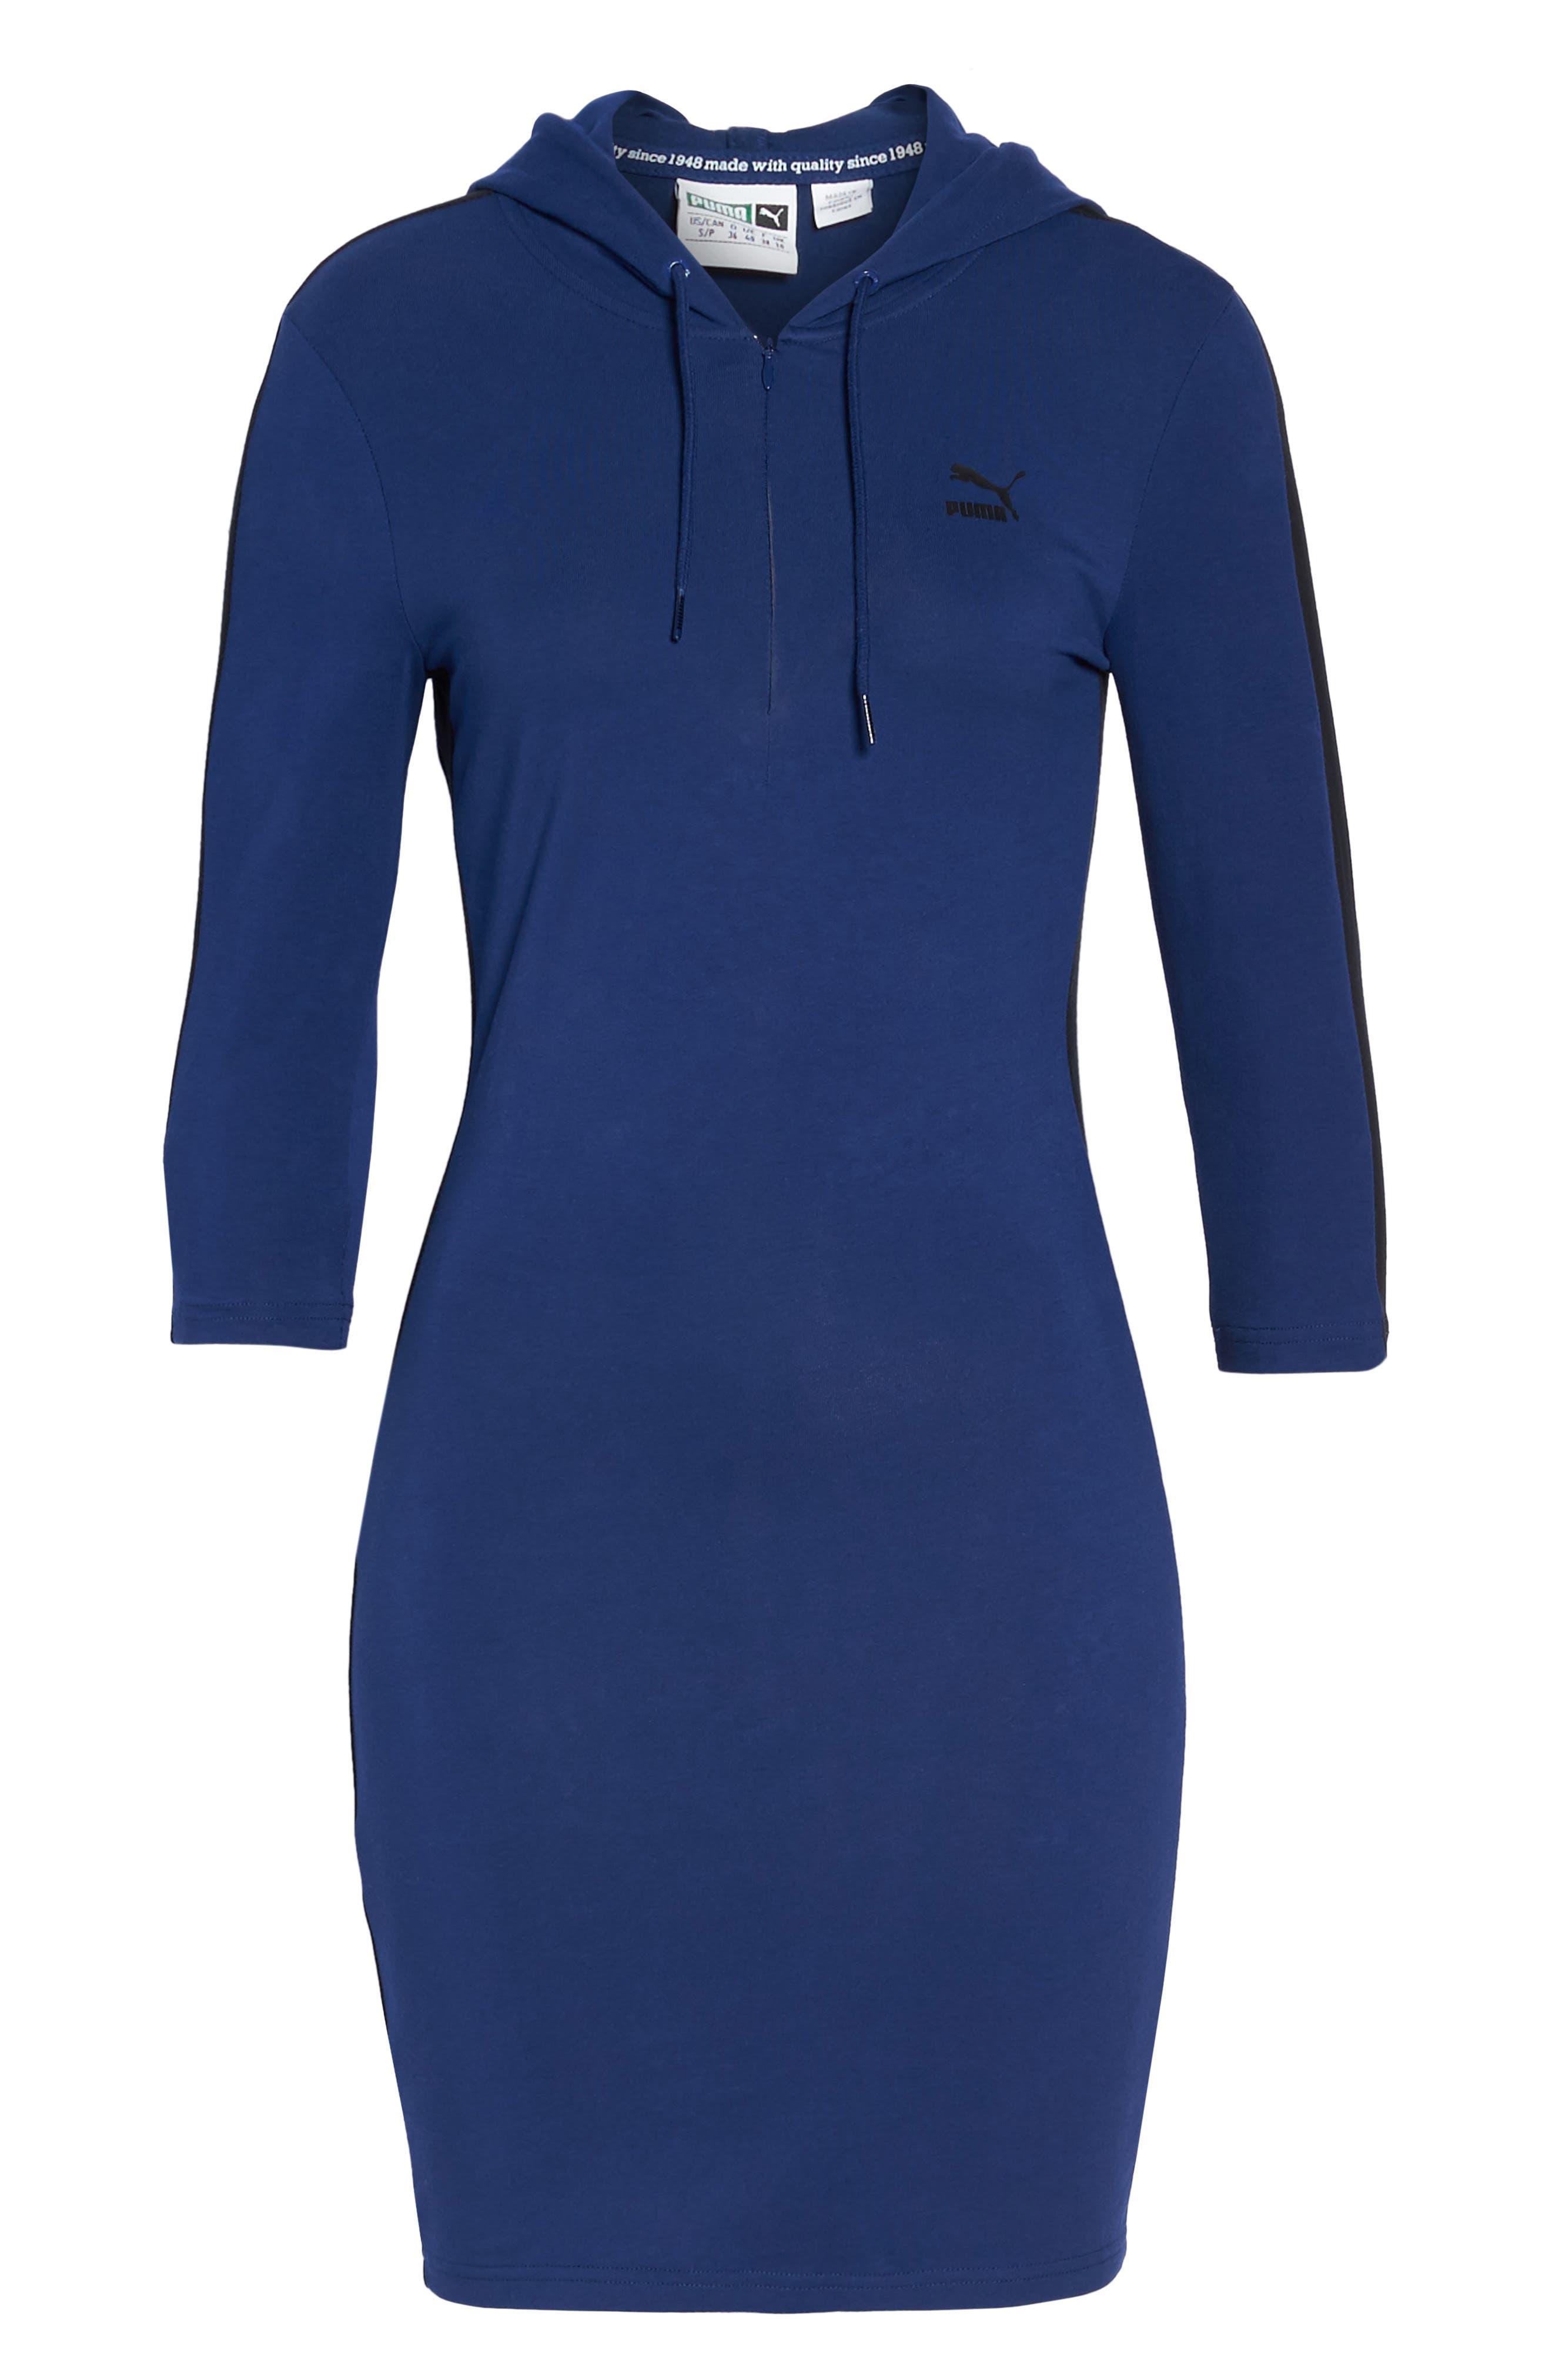 T7 Sweatshirt Dress,                             Alternate thumbnail 7, color,                             400